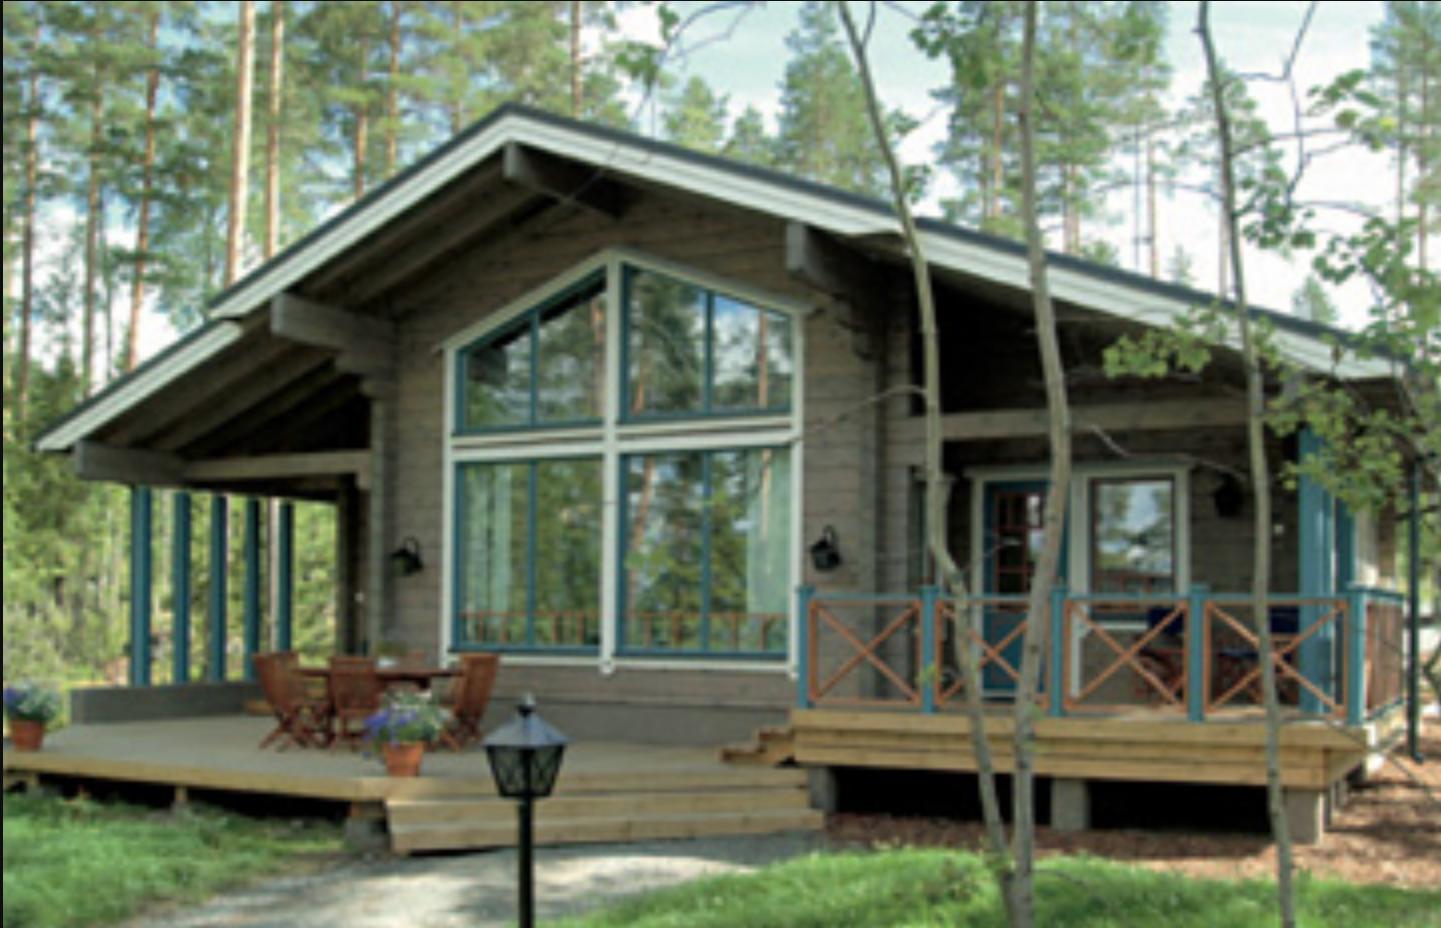 Casas rurales de madera casas de madera honkamajat natur - Casas rurales de madera ...